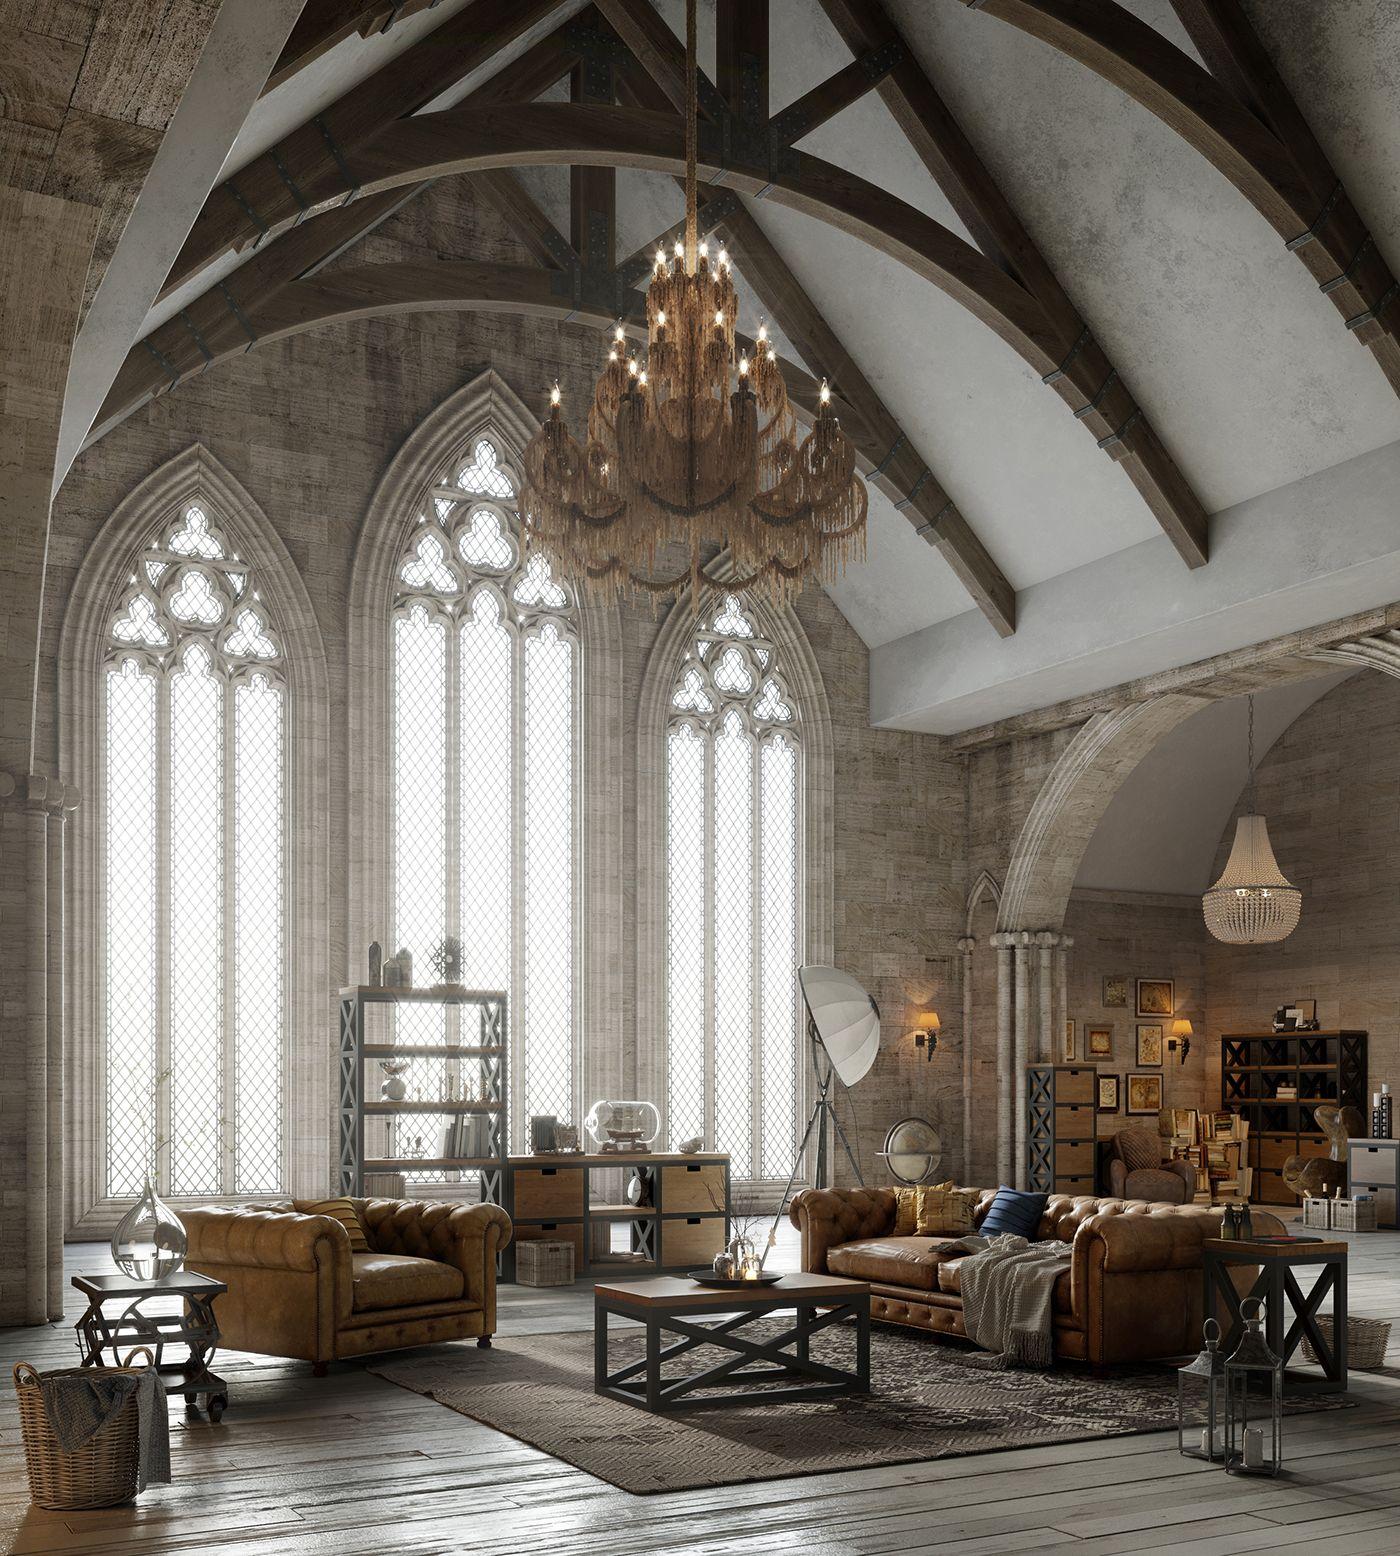 Loft Style Furniture Part 3 Design And Visualization Vizline